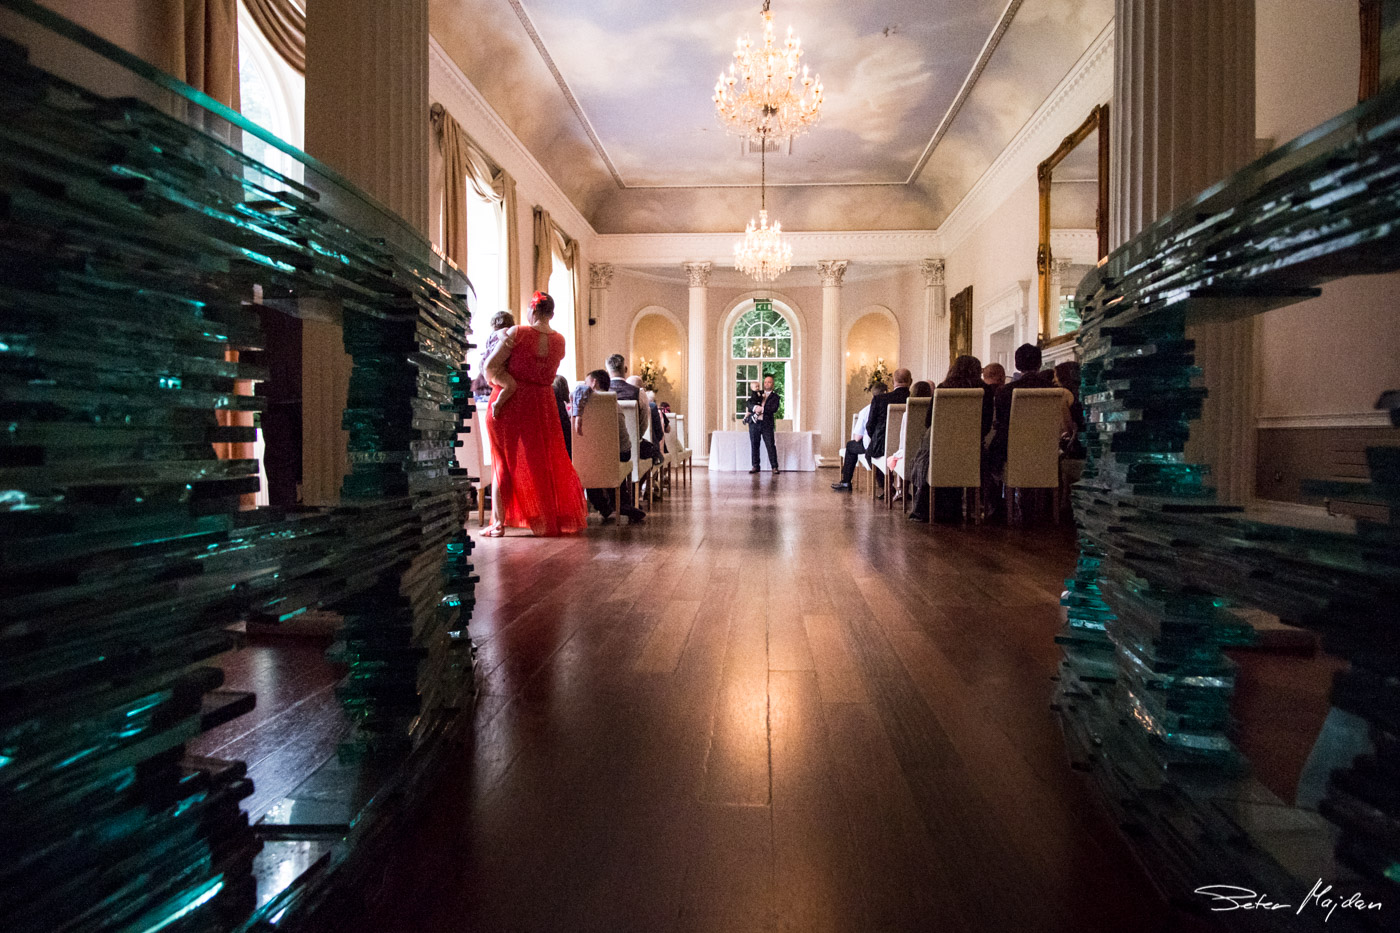 Colwick-hall-wedding-photography-12.jpg